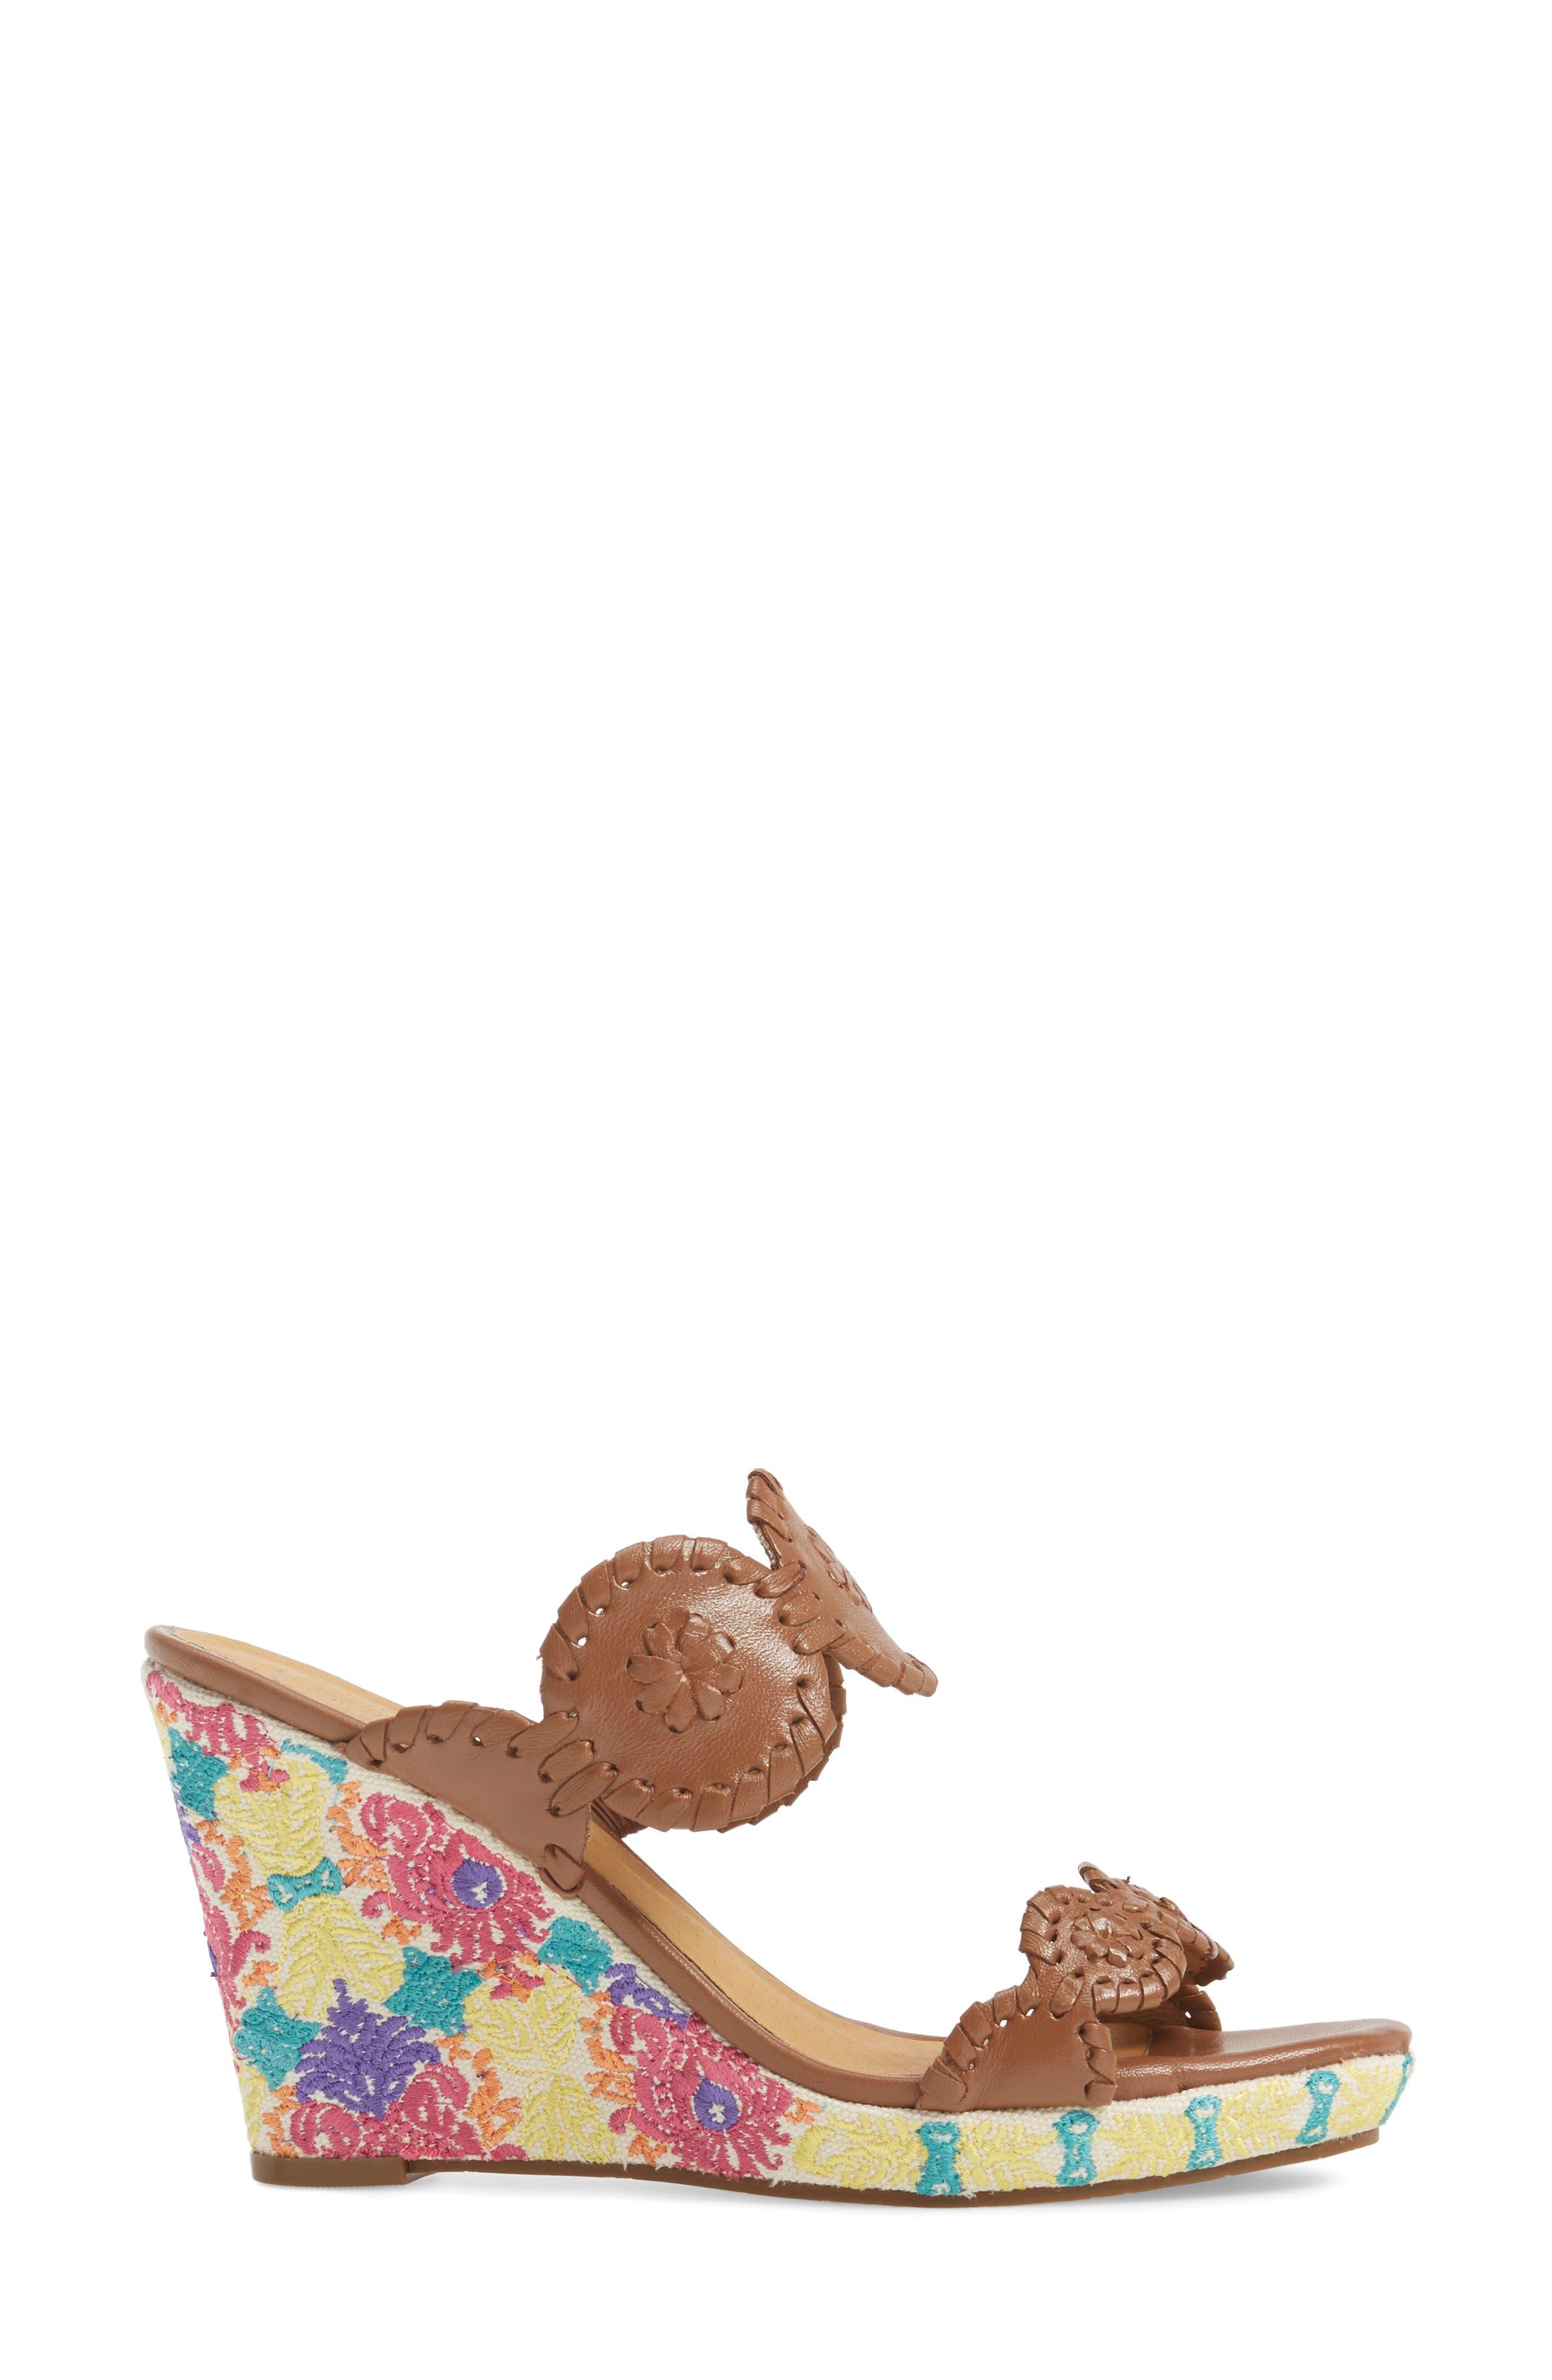 Livvy Wedge Slide Sandal,                             Alternate thumbnail 3, color,                             Cognac Leather